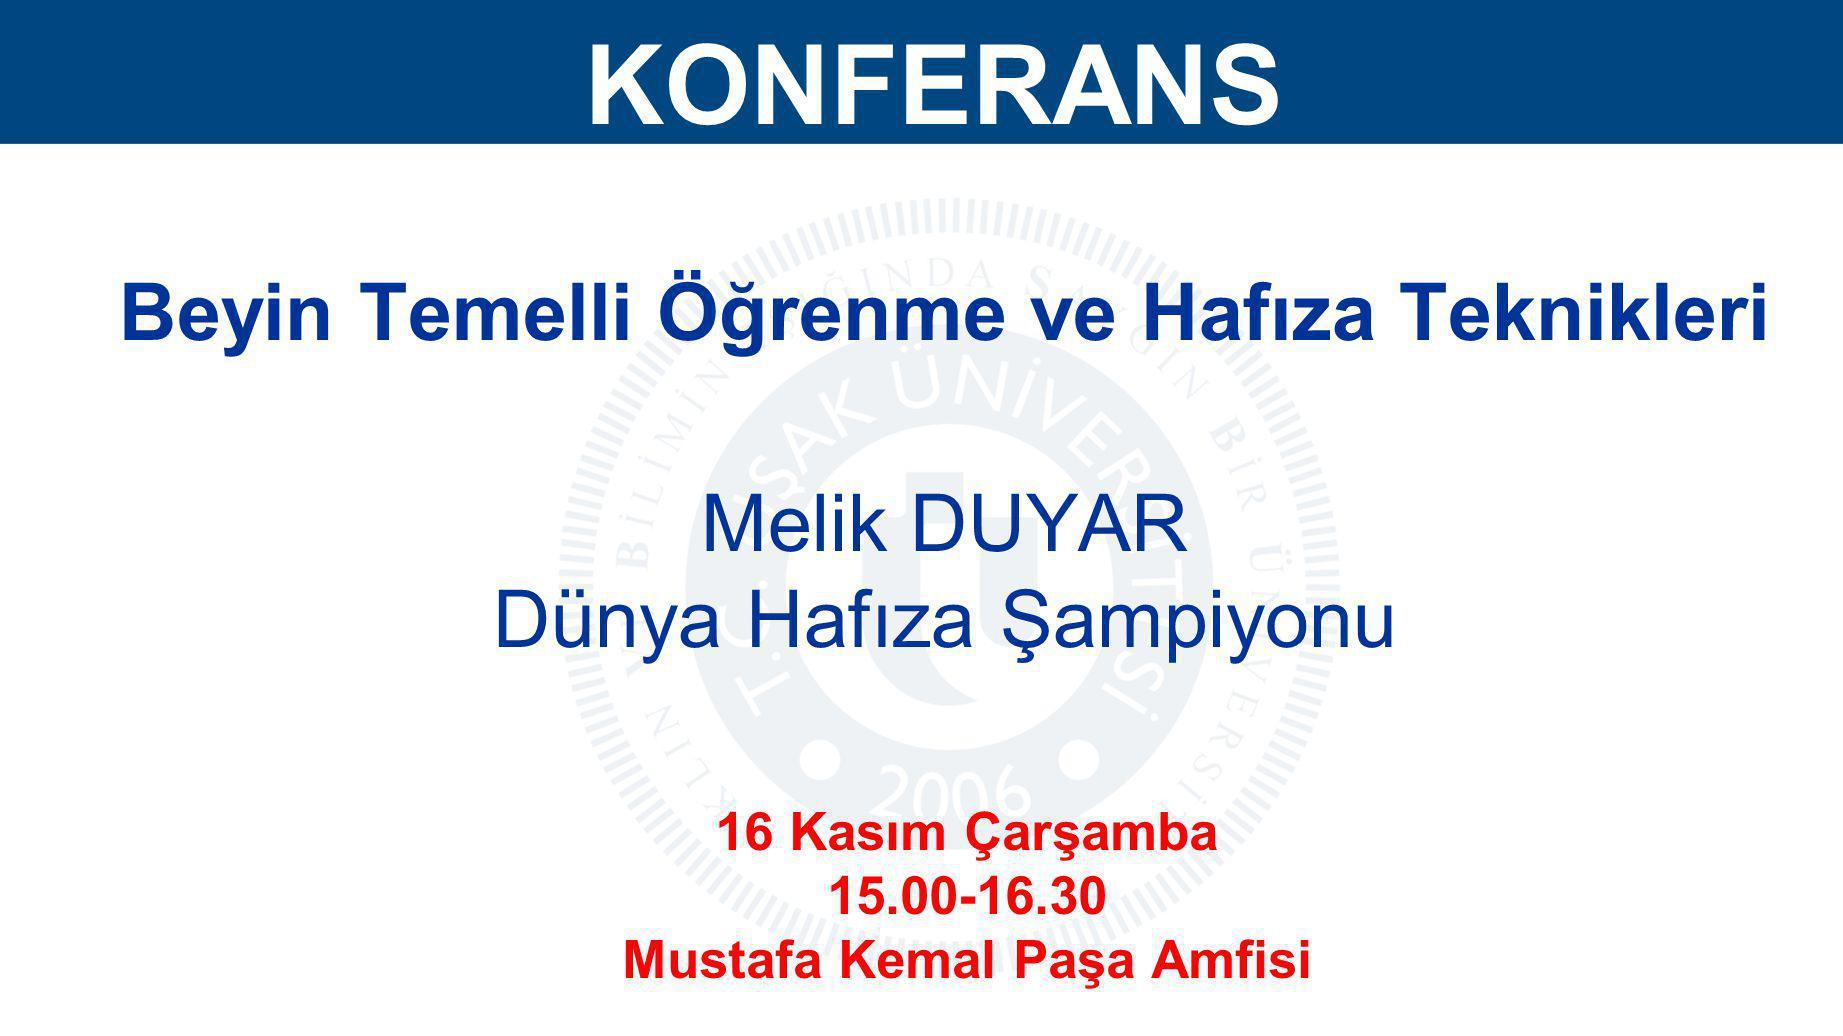 16 Kasım Çarşamba 15.00-16.30 Mustafa Kemal Paşa Amfisi